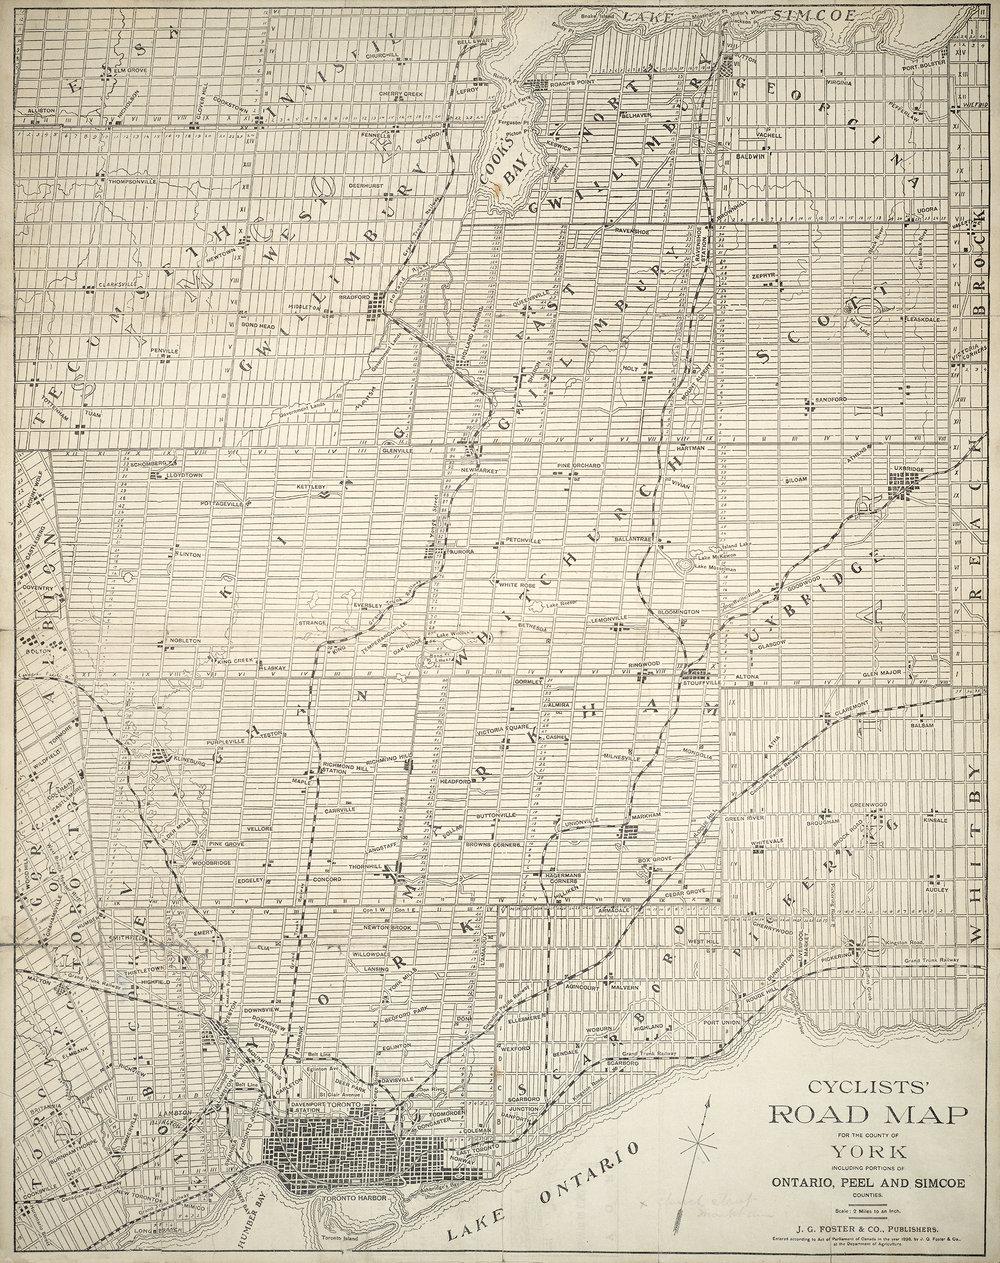 Toronto Area 1896 cyclist map.jpg